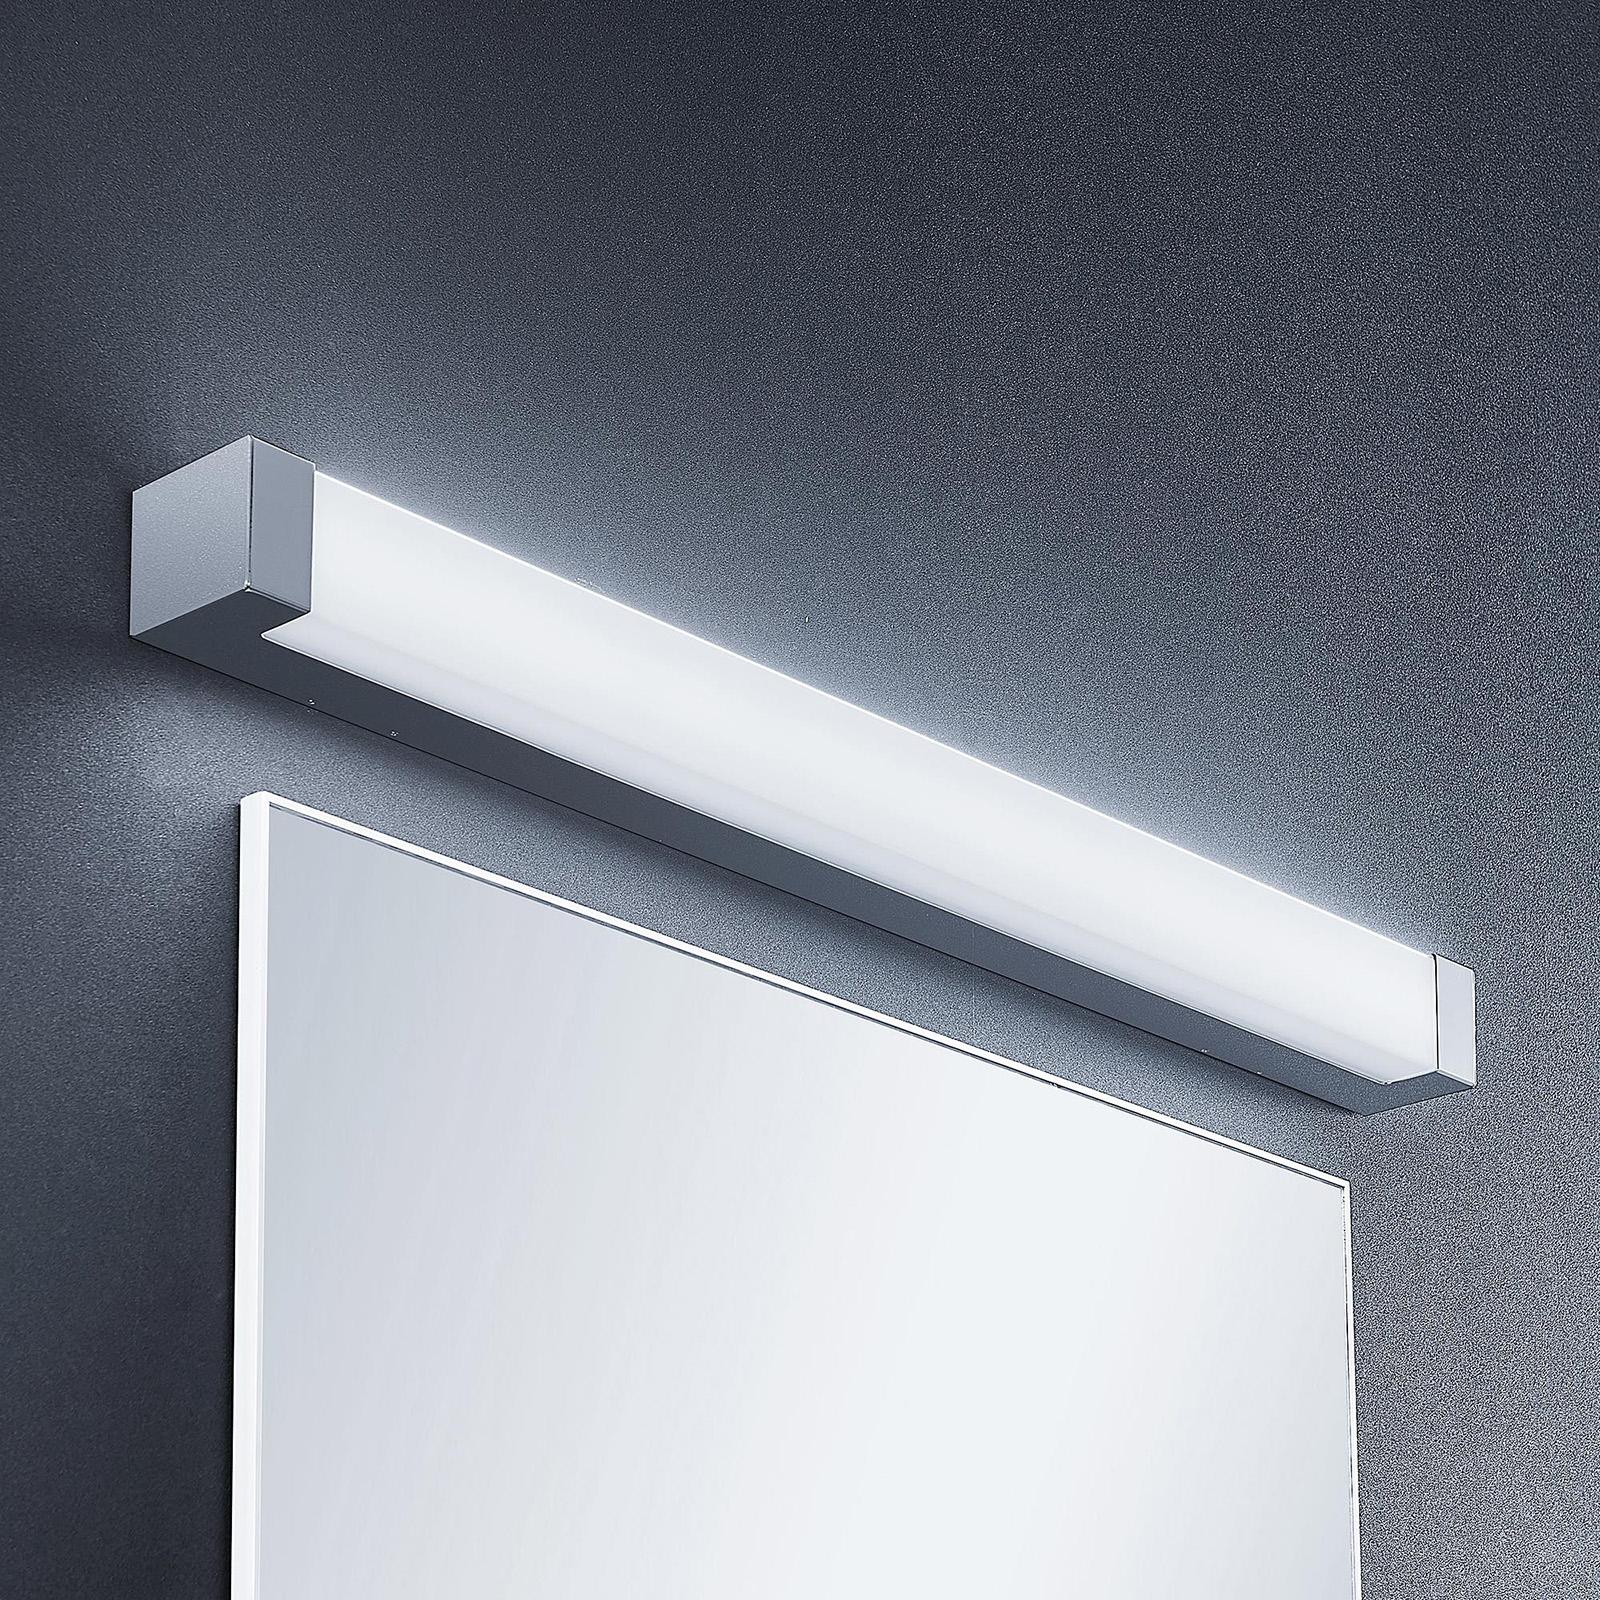 Lindby Skara LED-badrumslampa, 90 cm